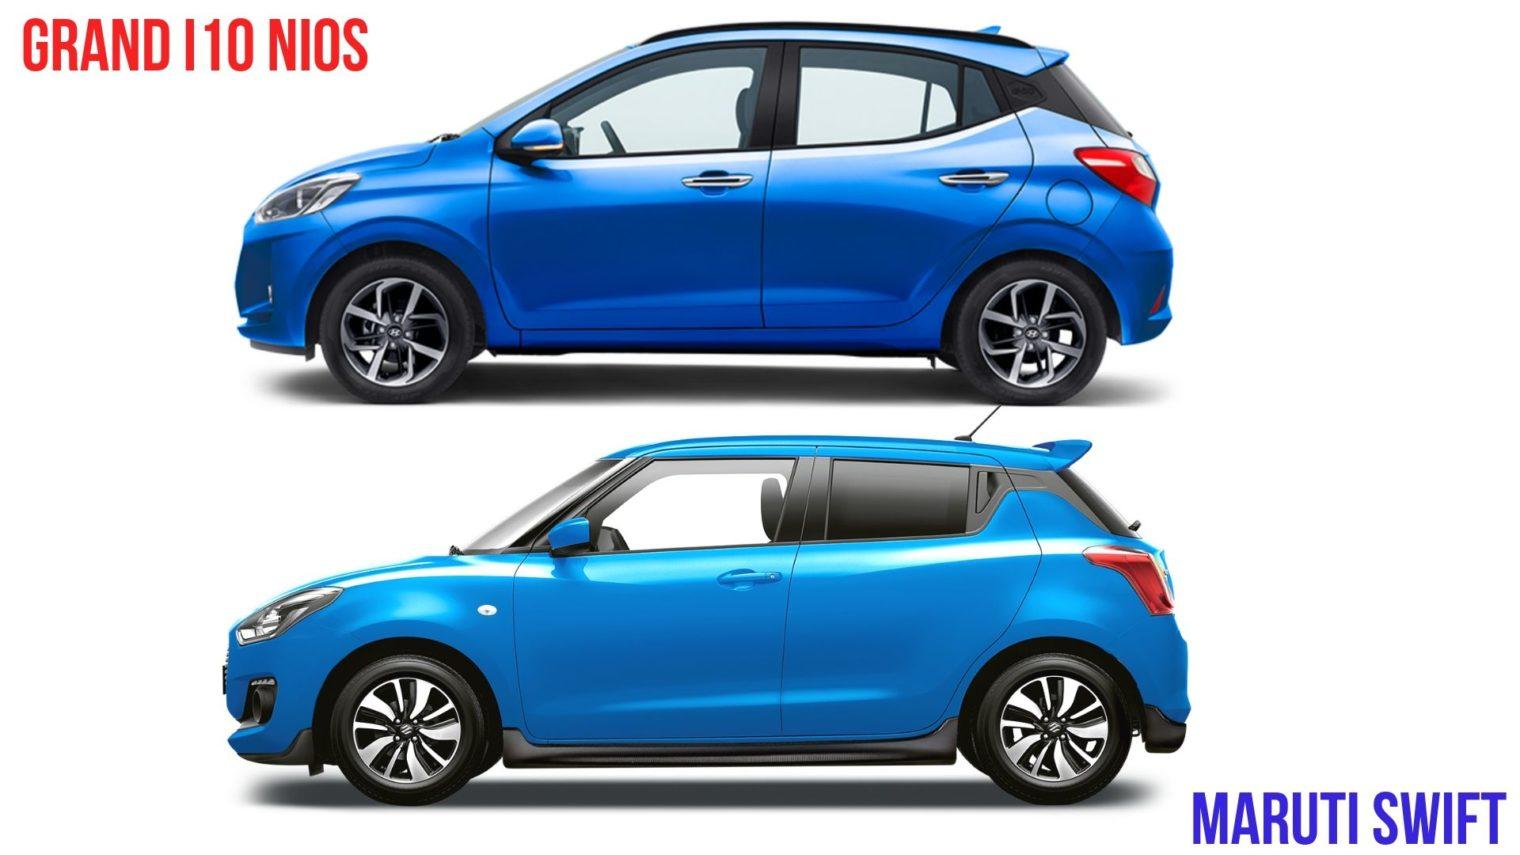 Hyundai Grand i10 Nios vs Maruti Suzuki Swift Comparison1